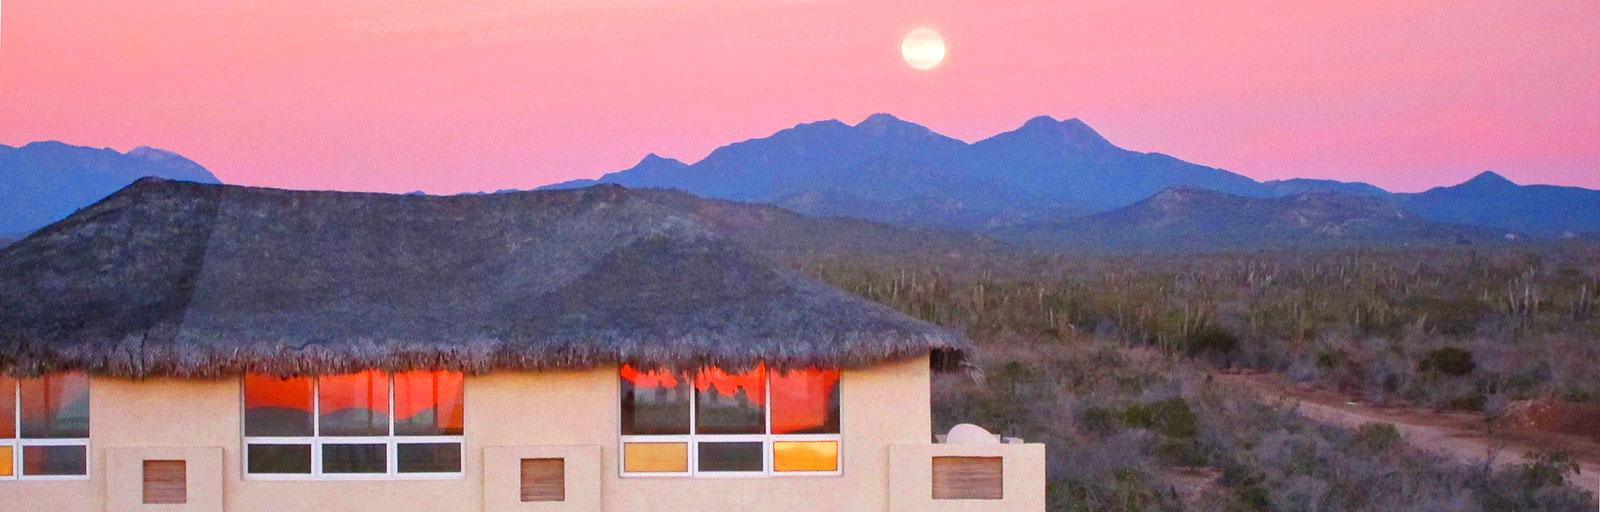 Mexico Yoga Retreat Yoga Studio: Moonrise Over One Yoga Studio